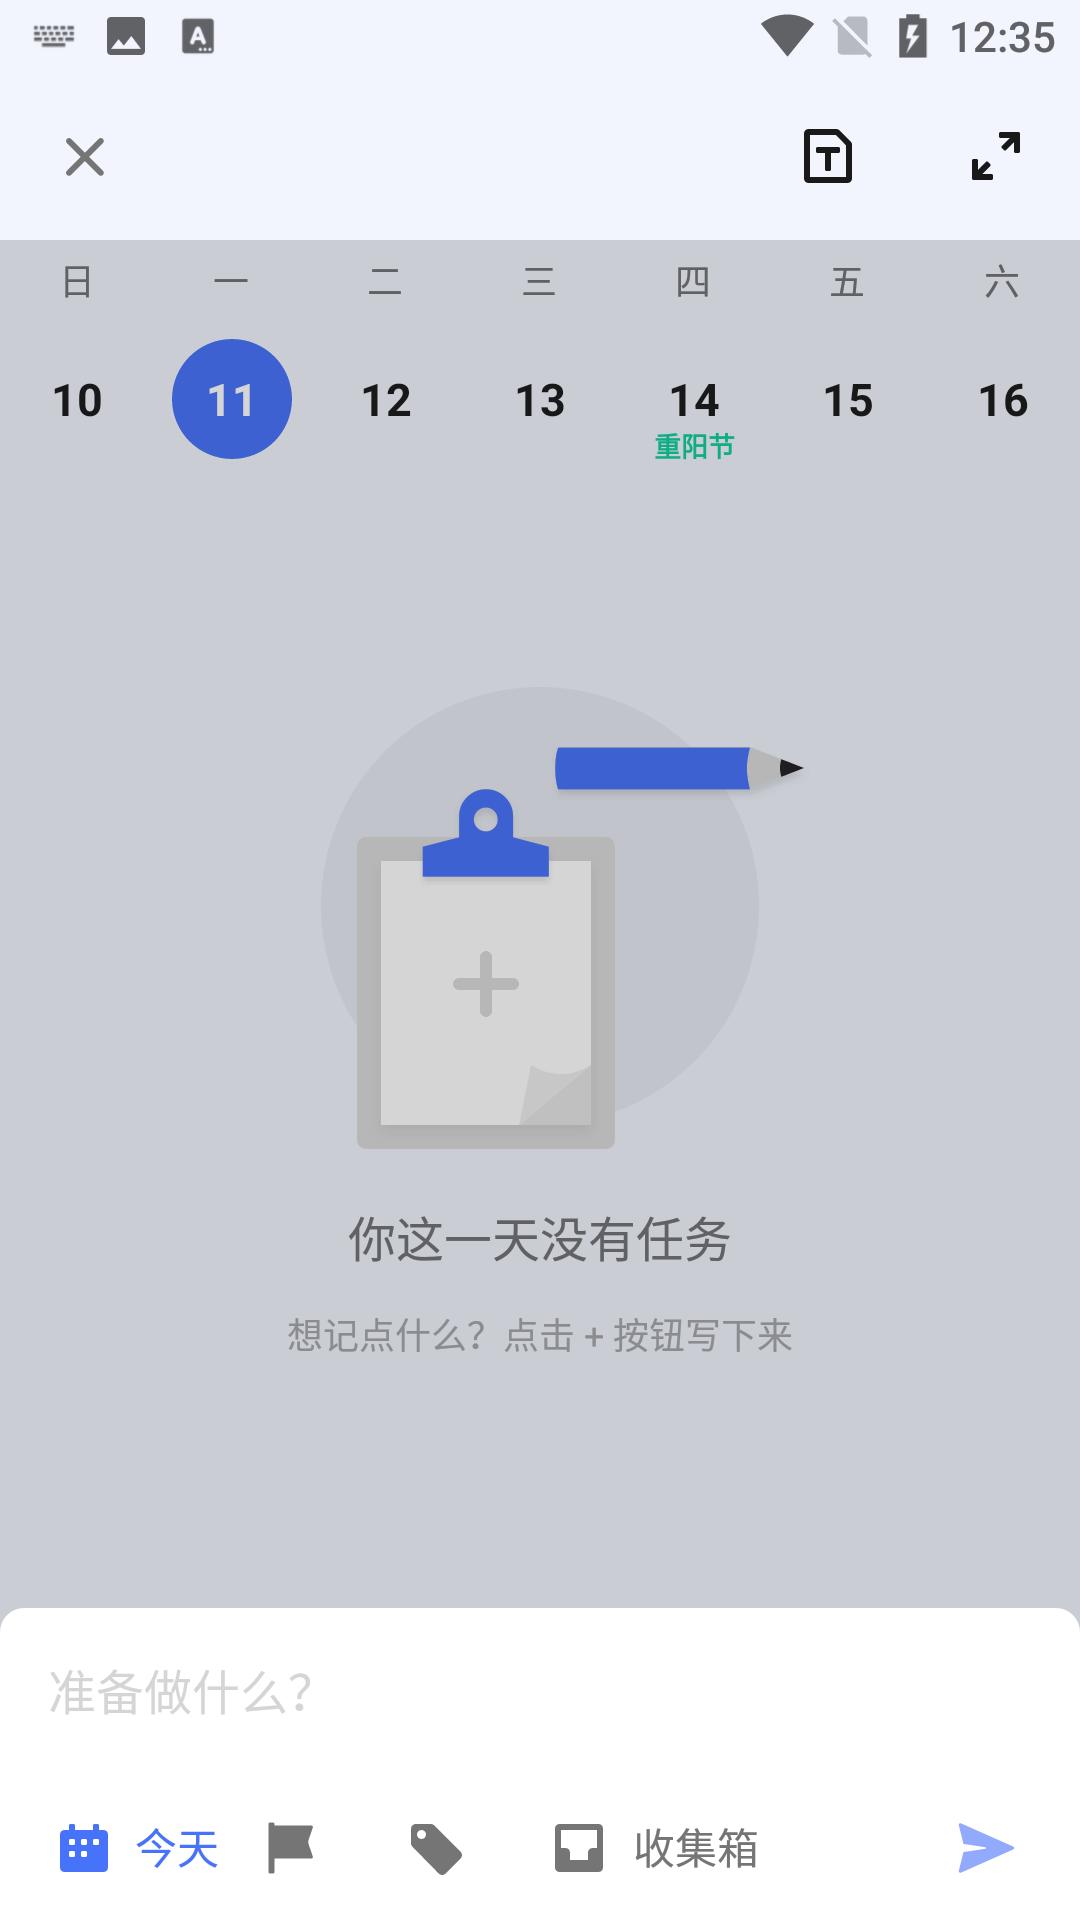 Screenshot_20211011-003552.png